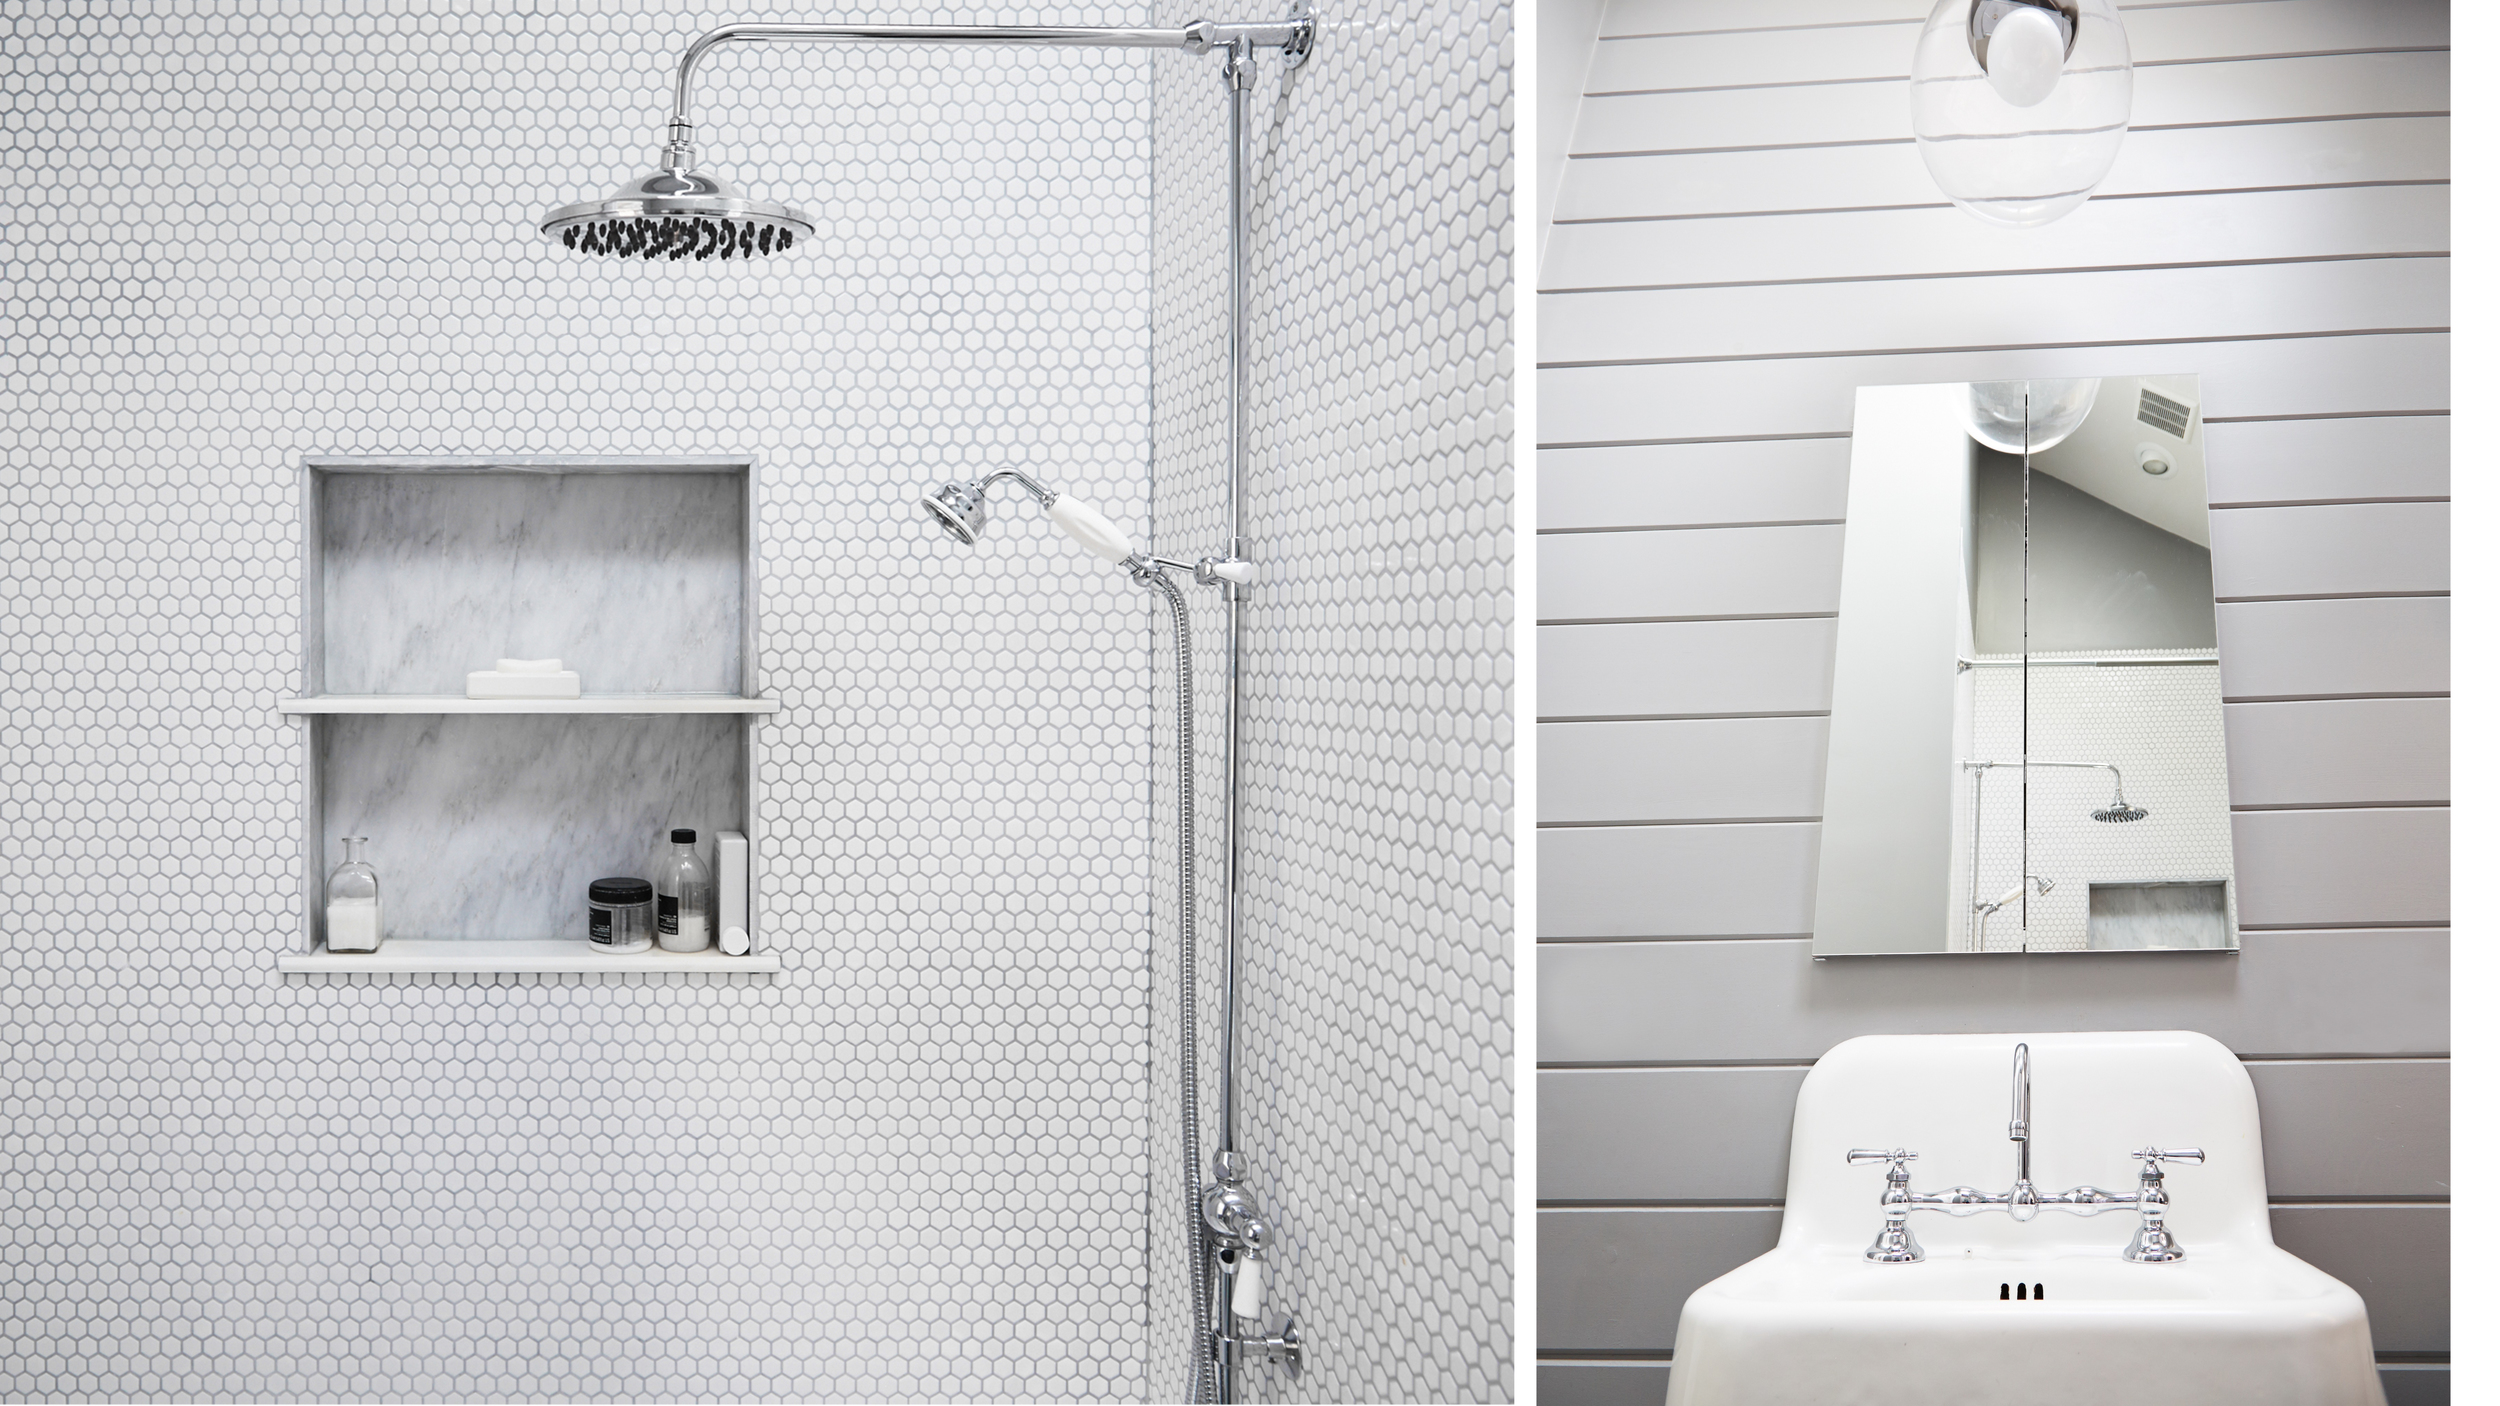 Rockwell_Bathroom_Details.jpg